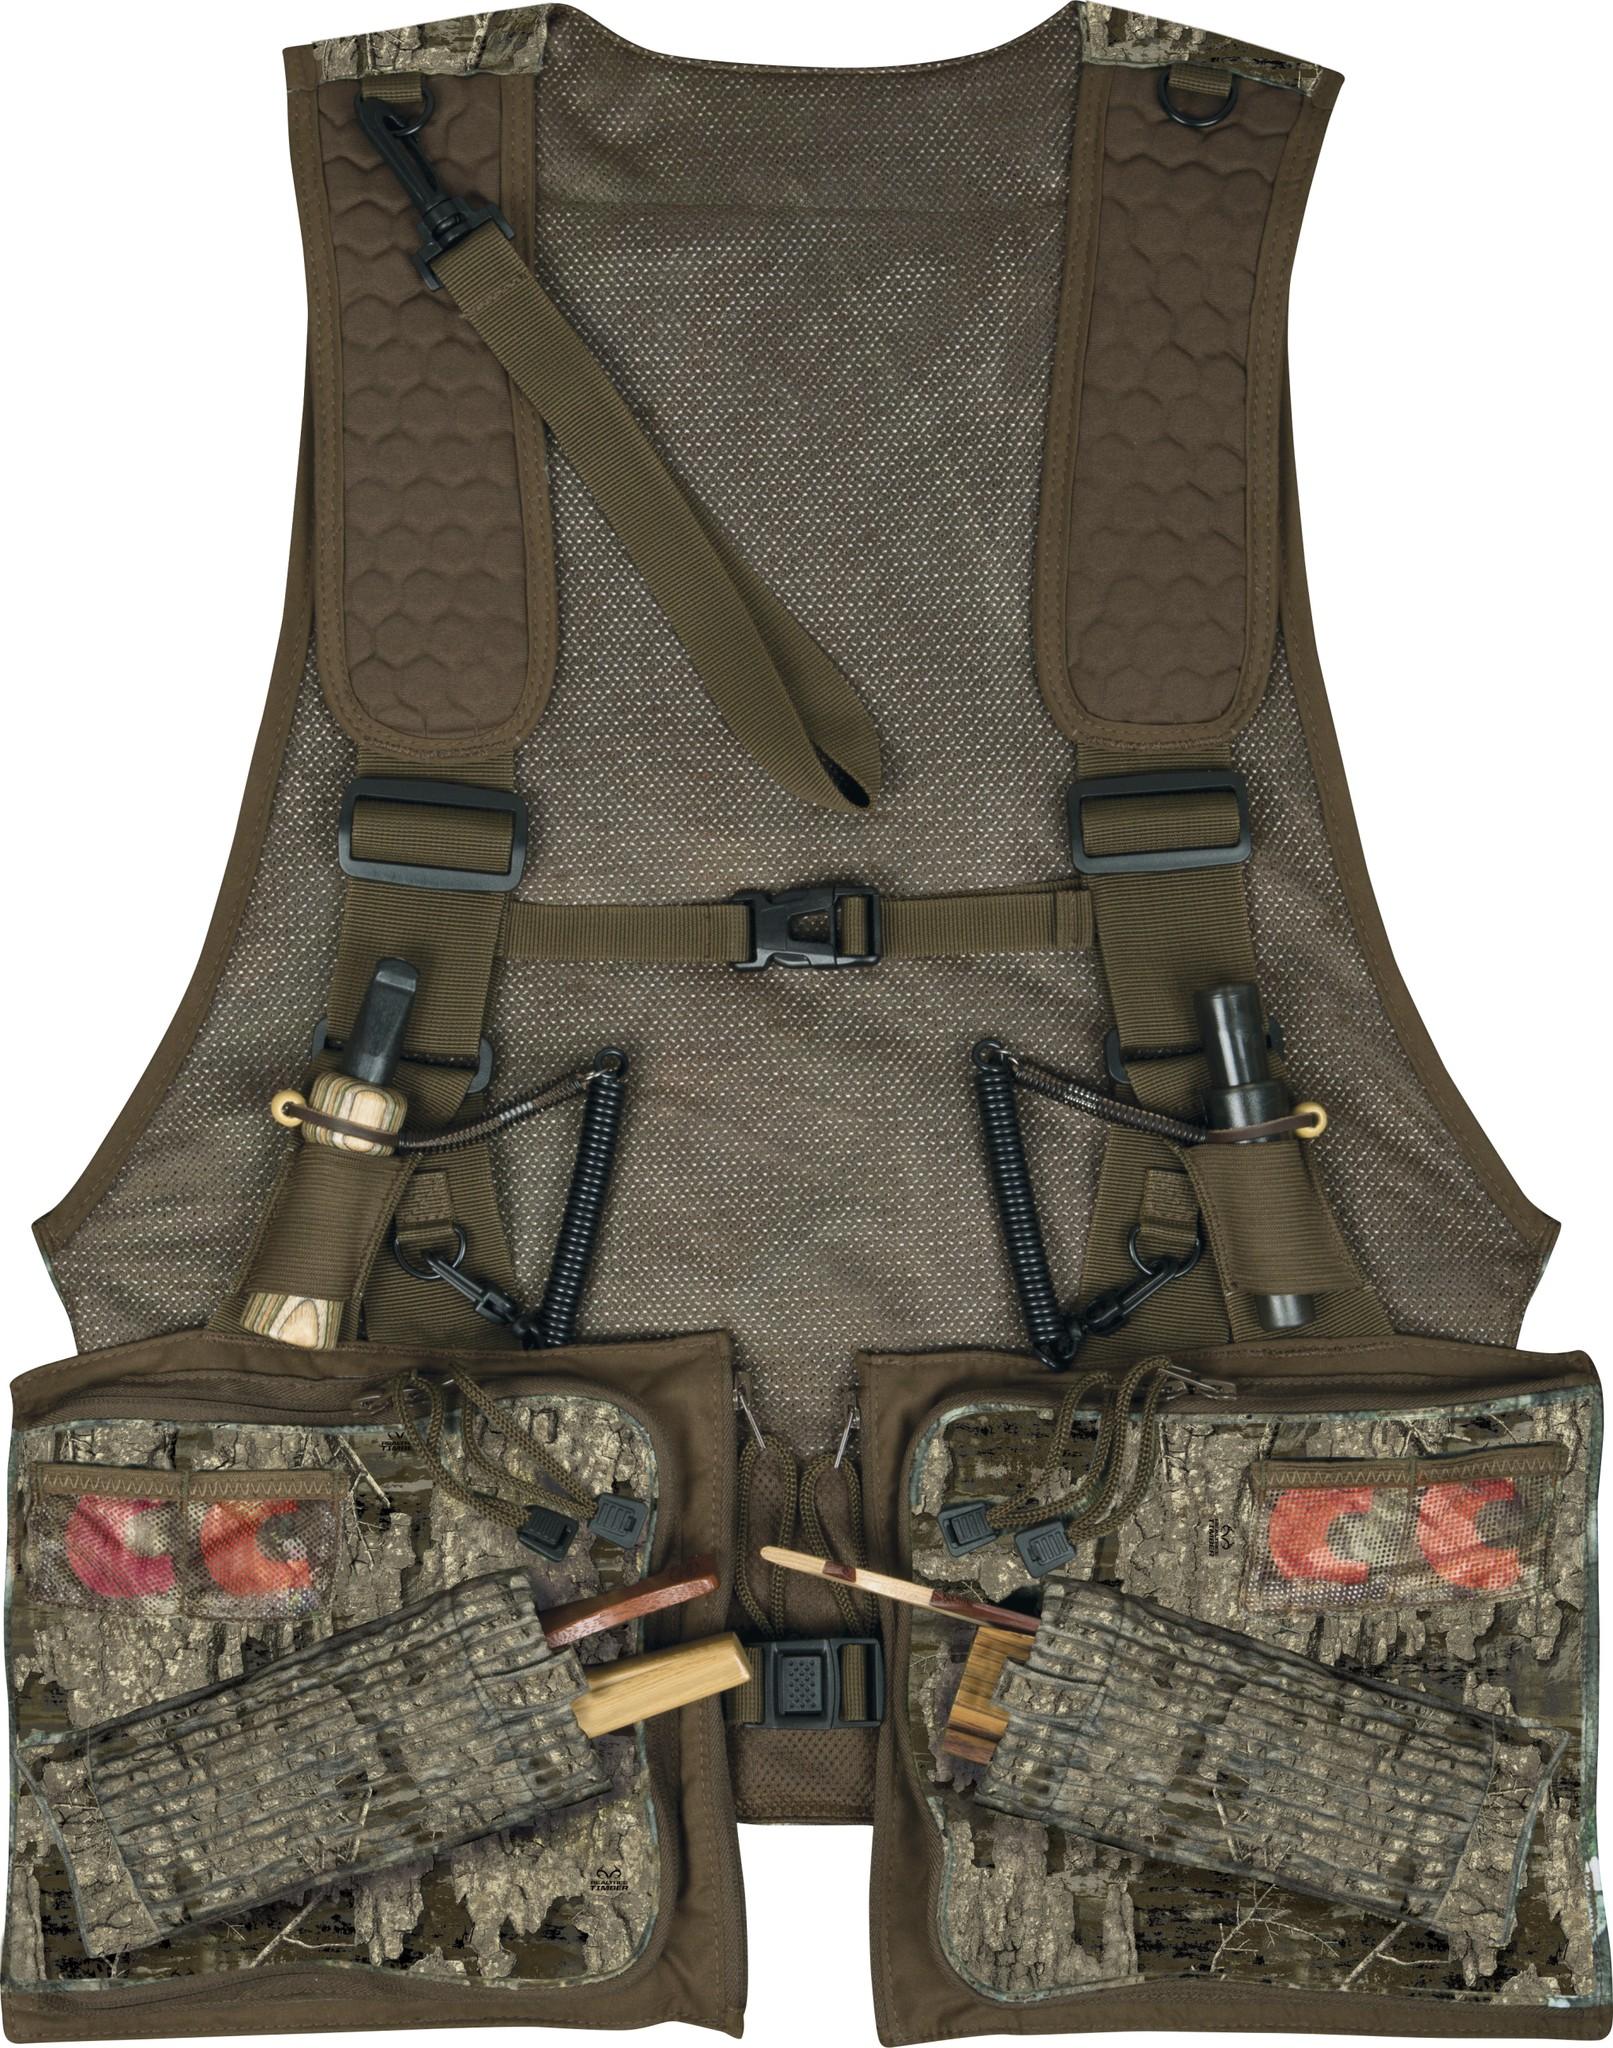 17223f59c1834 OL' Tom Michael Waddell Signature Series Time & Motion Strap Vest ...